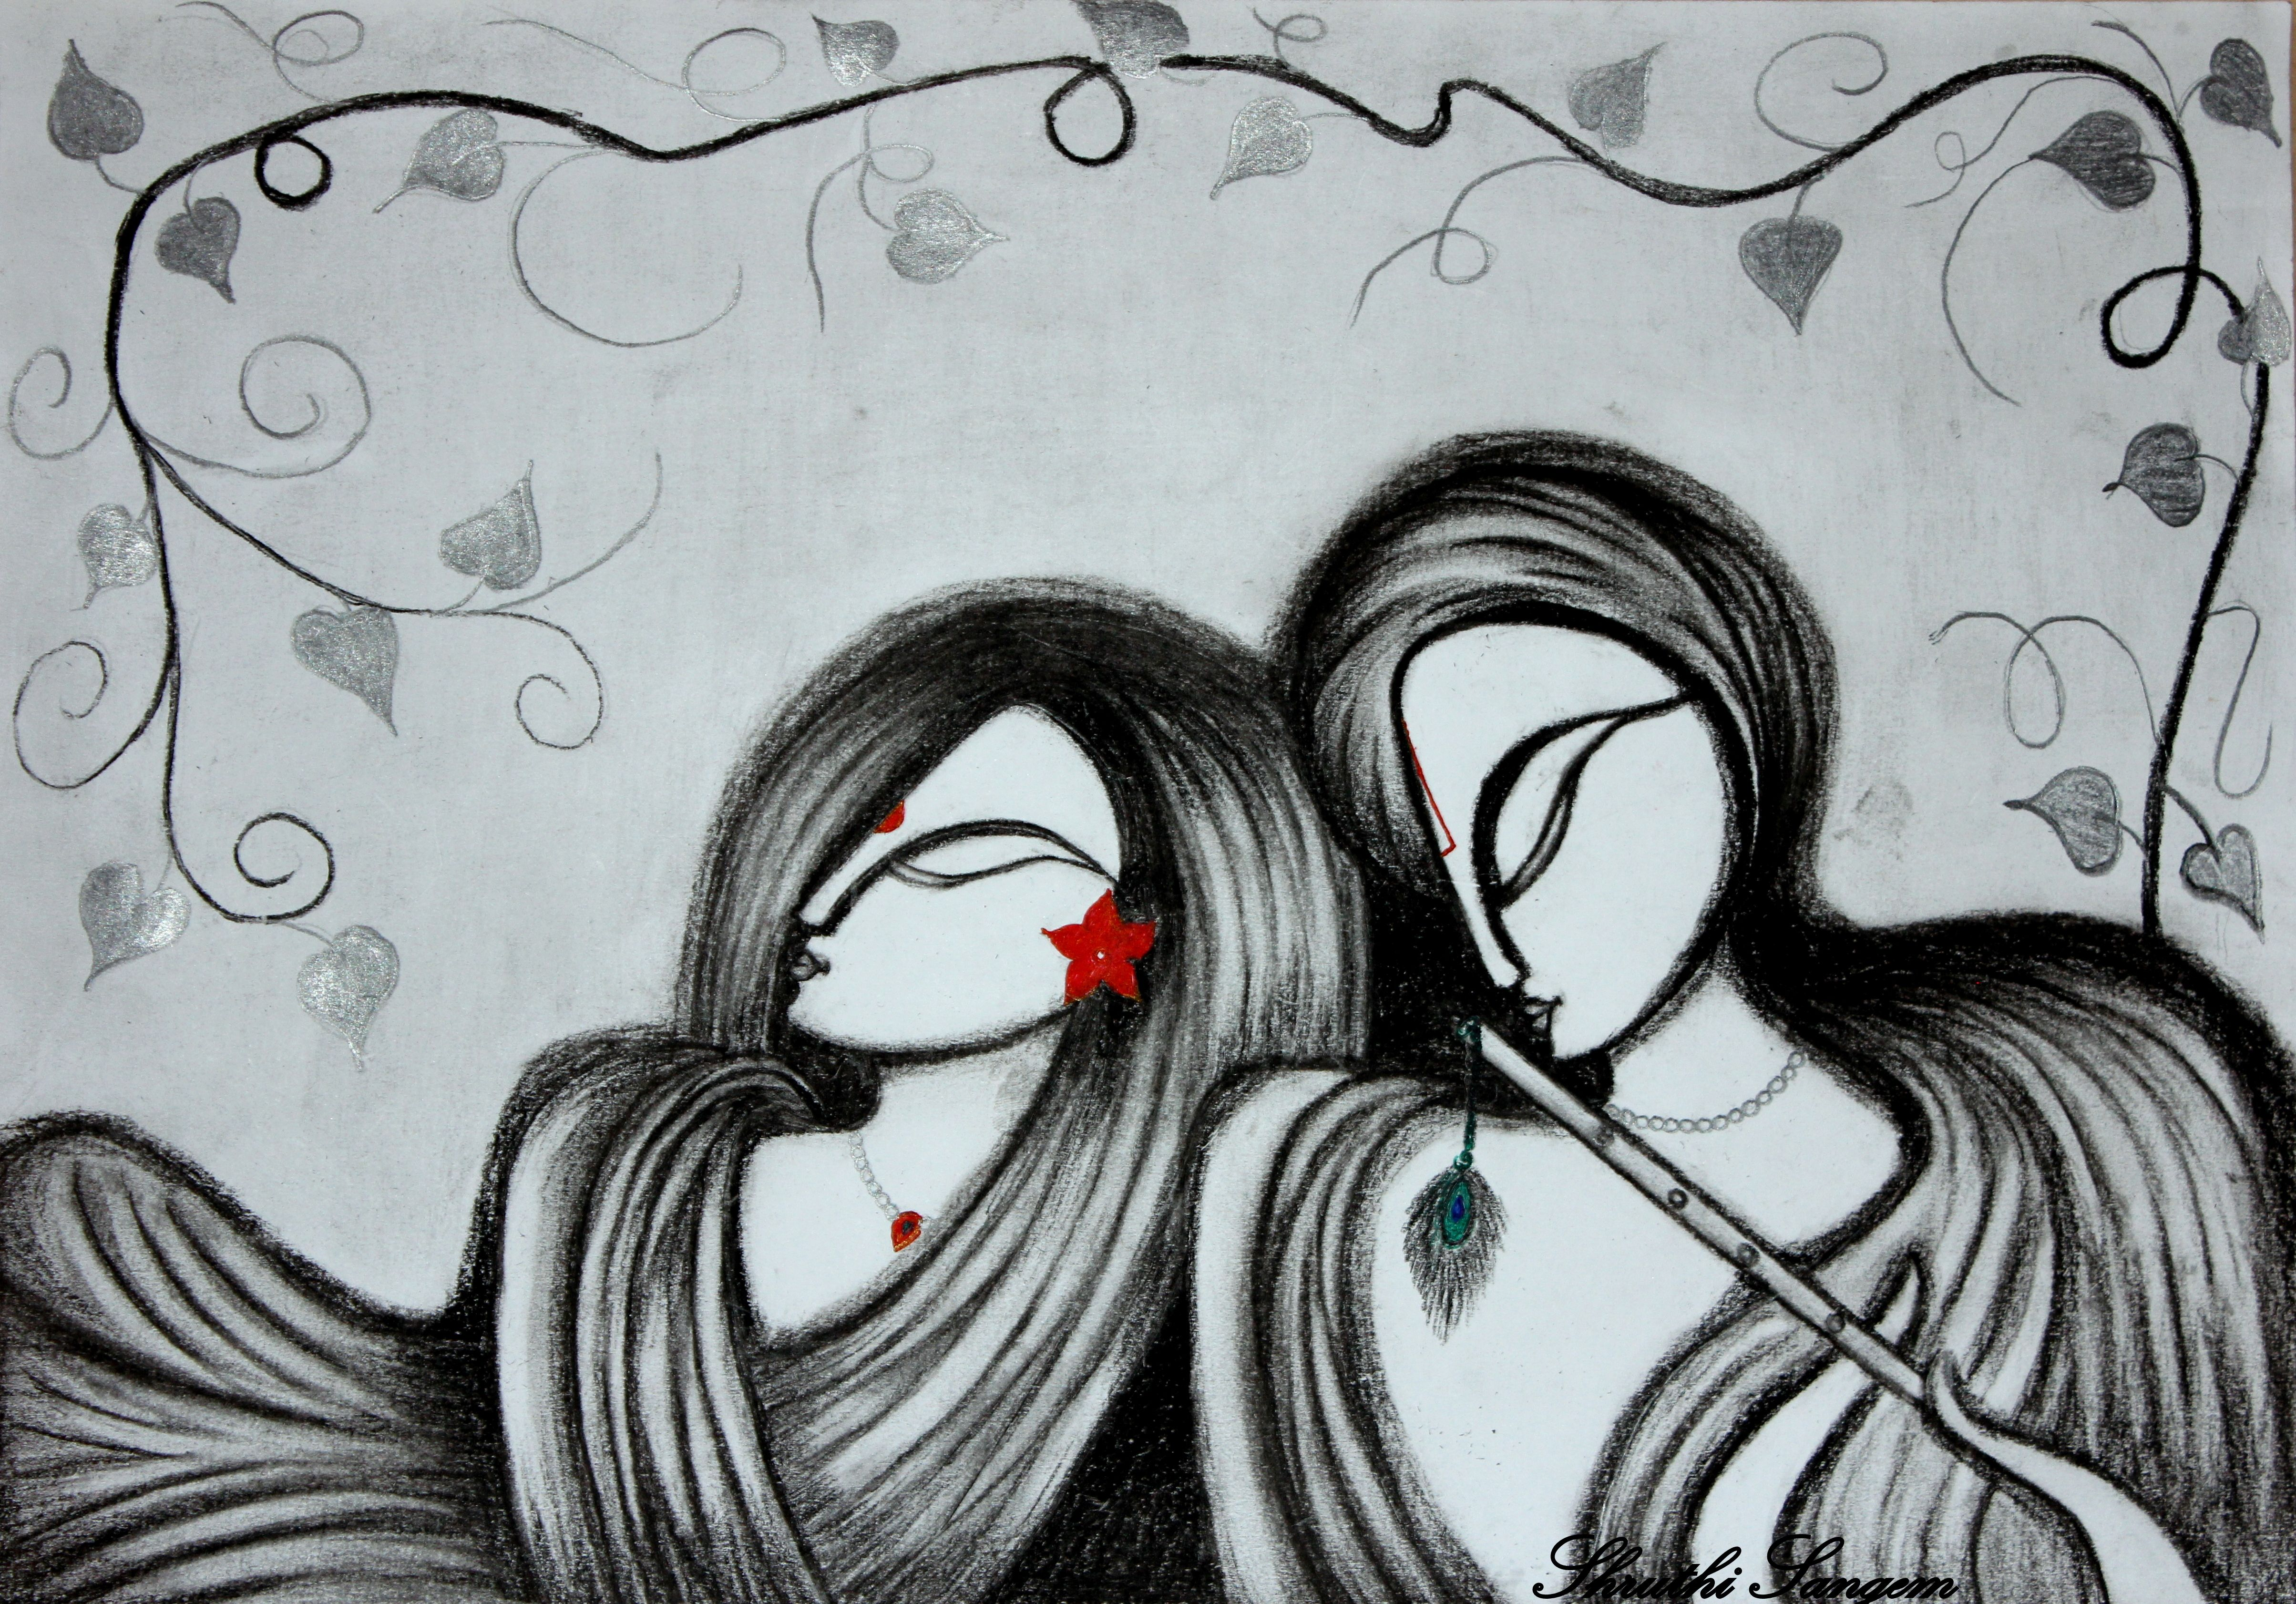 Radha krishna charcoal sketch arte pencil drawings drawings